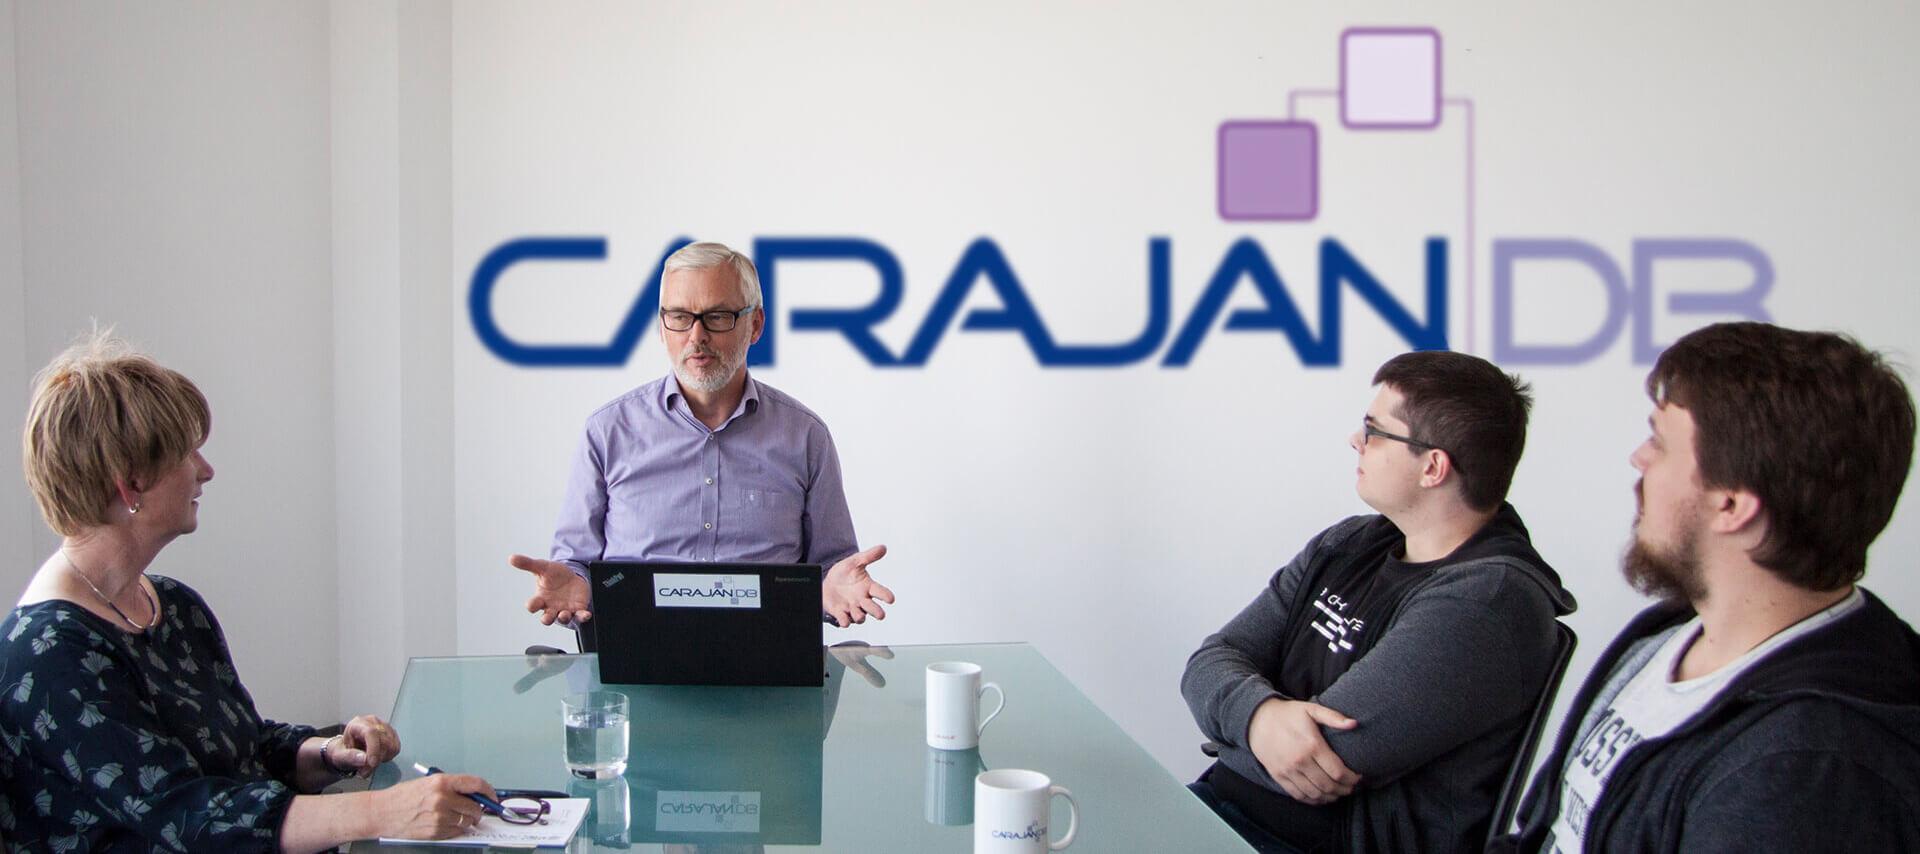 CarajanDB - The Oracle Database Experts!